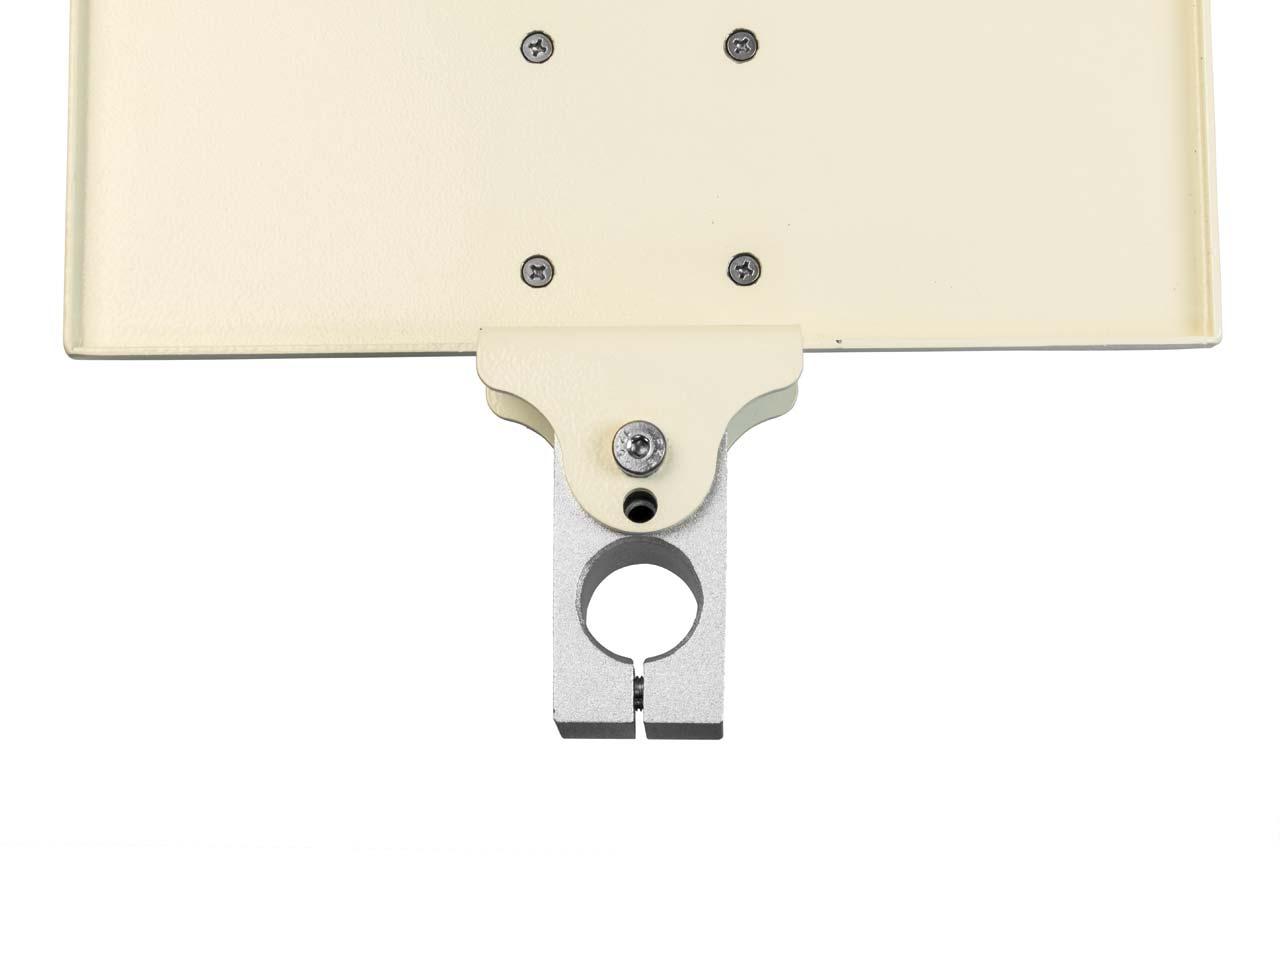 Genuine-US-Foredom-Workbench-Accessories-System miniatura 41